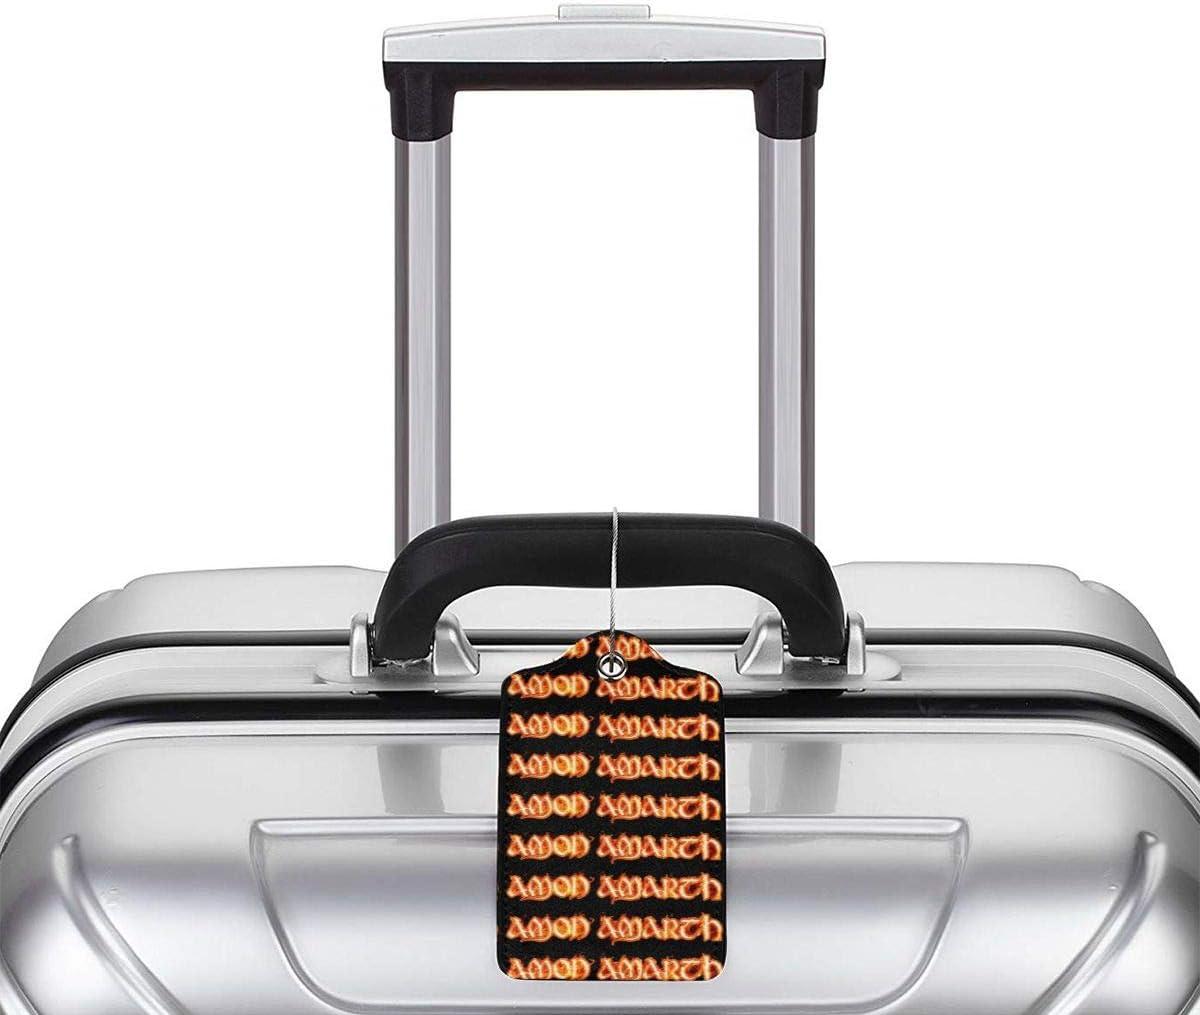 LIKUNMING Amon Amarth Logo Travel Luggage Tags Travel Suitcase Bag Labels Checked Baggage Tags